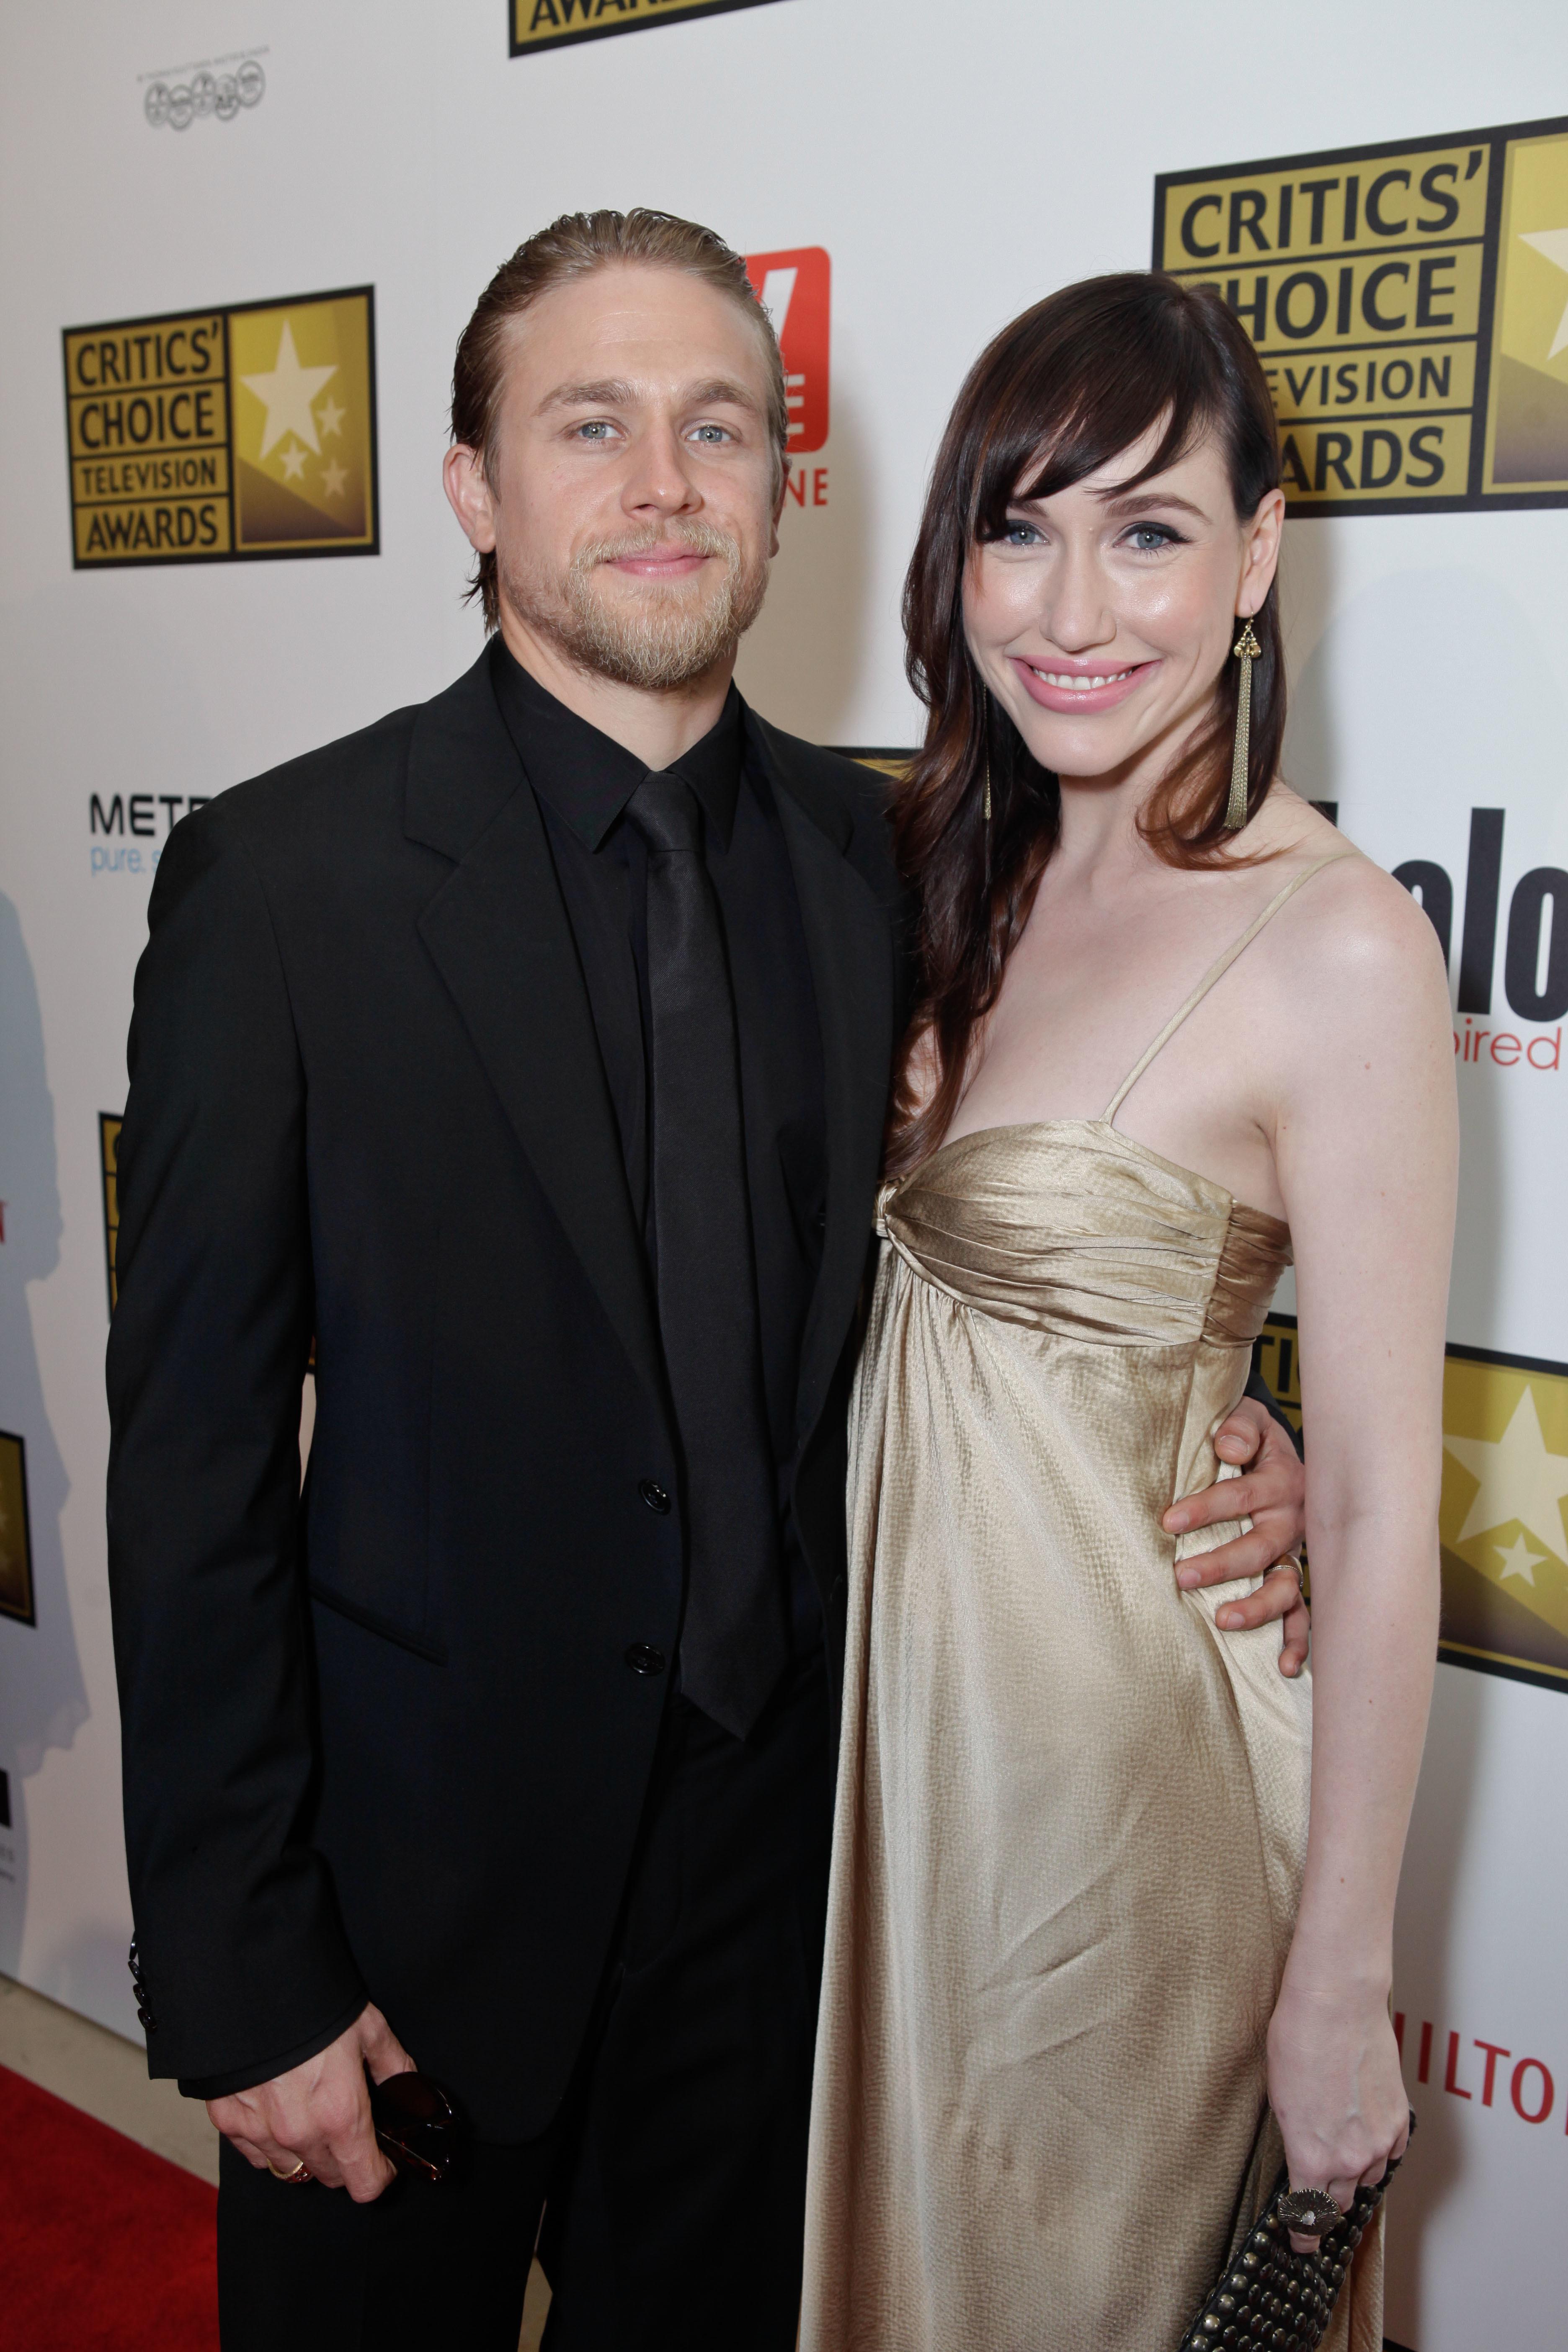 Charlie Hunnam, girlfriend Morgana McNelis